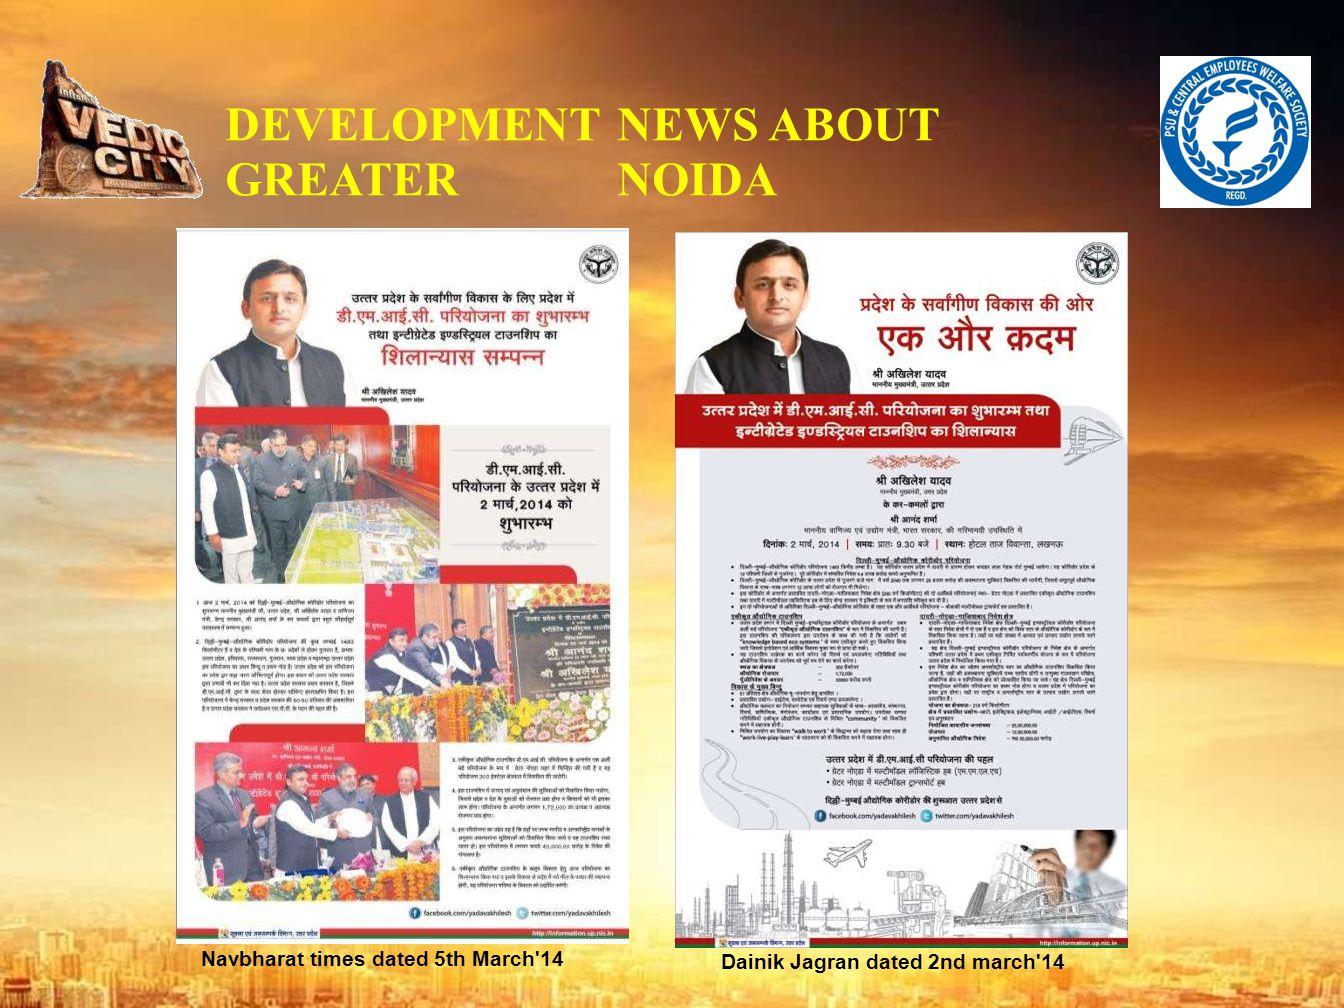 GREATER NOIDA DEVELOPMENT NEWS ABOUT